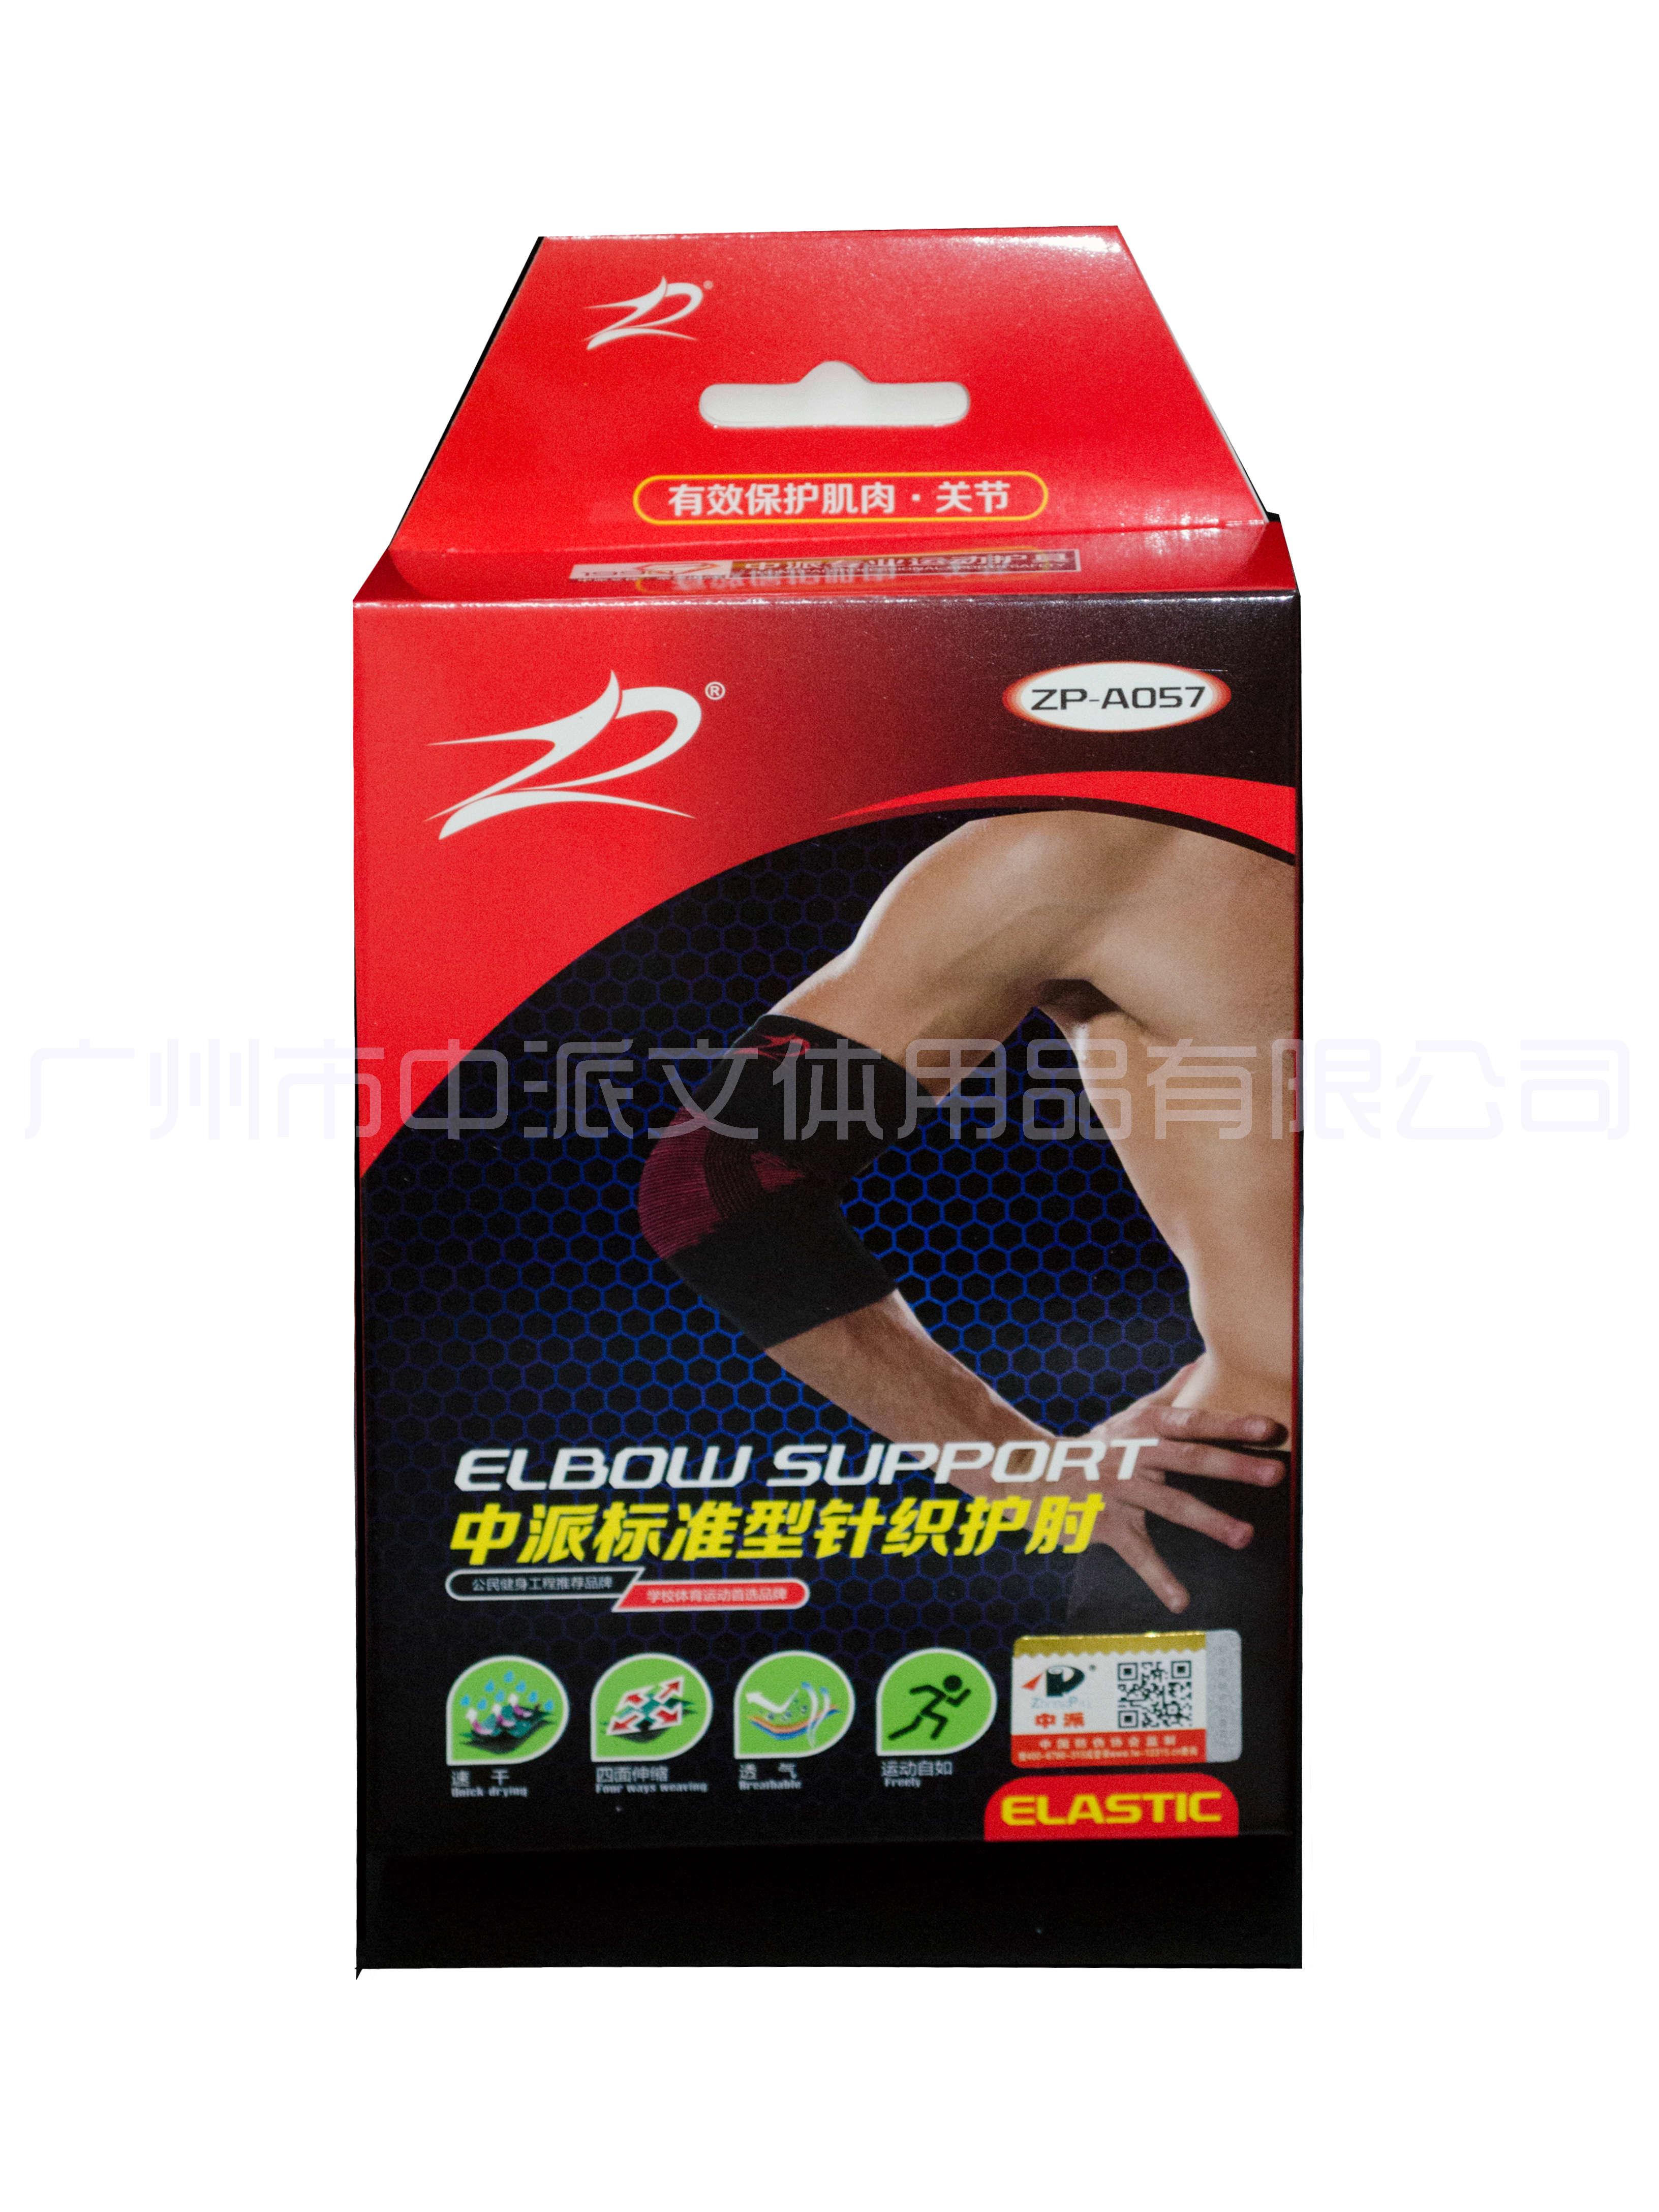 ZP-A057 中派标准型针织护肘 ZHONGPAI Elbow Support